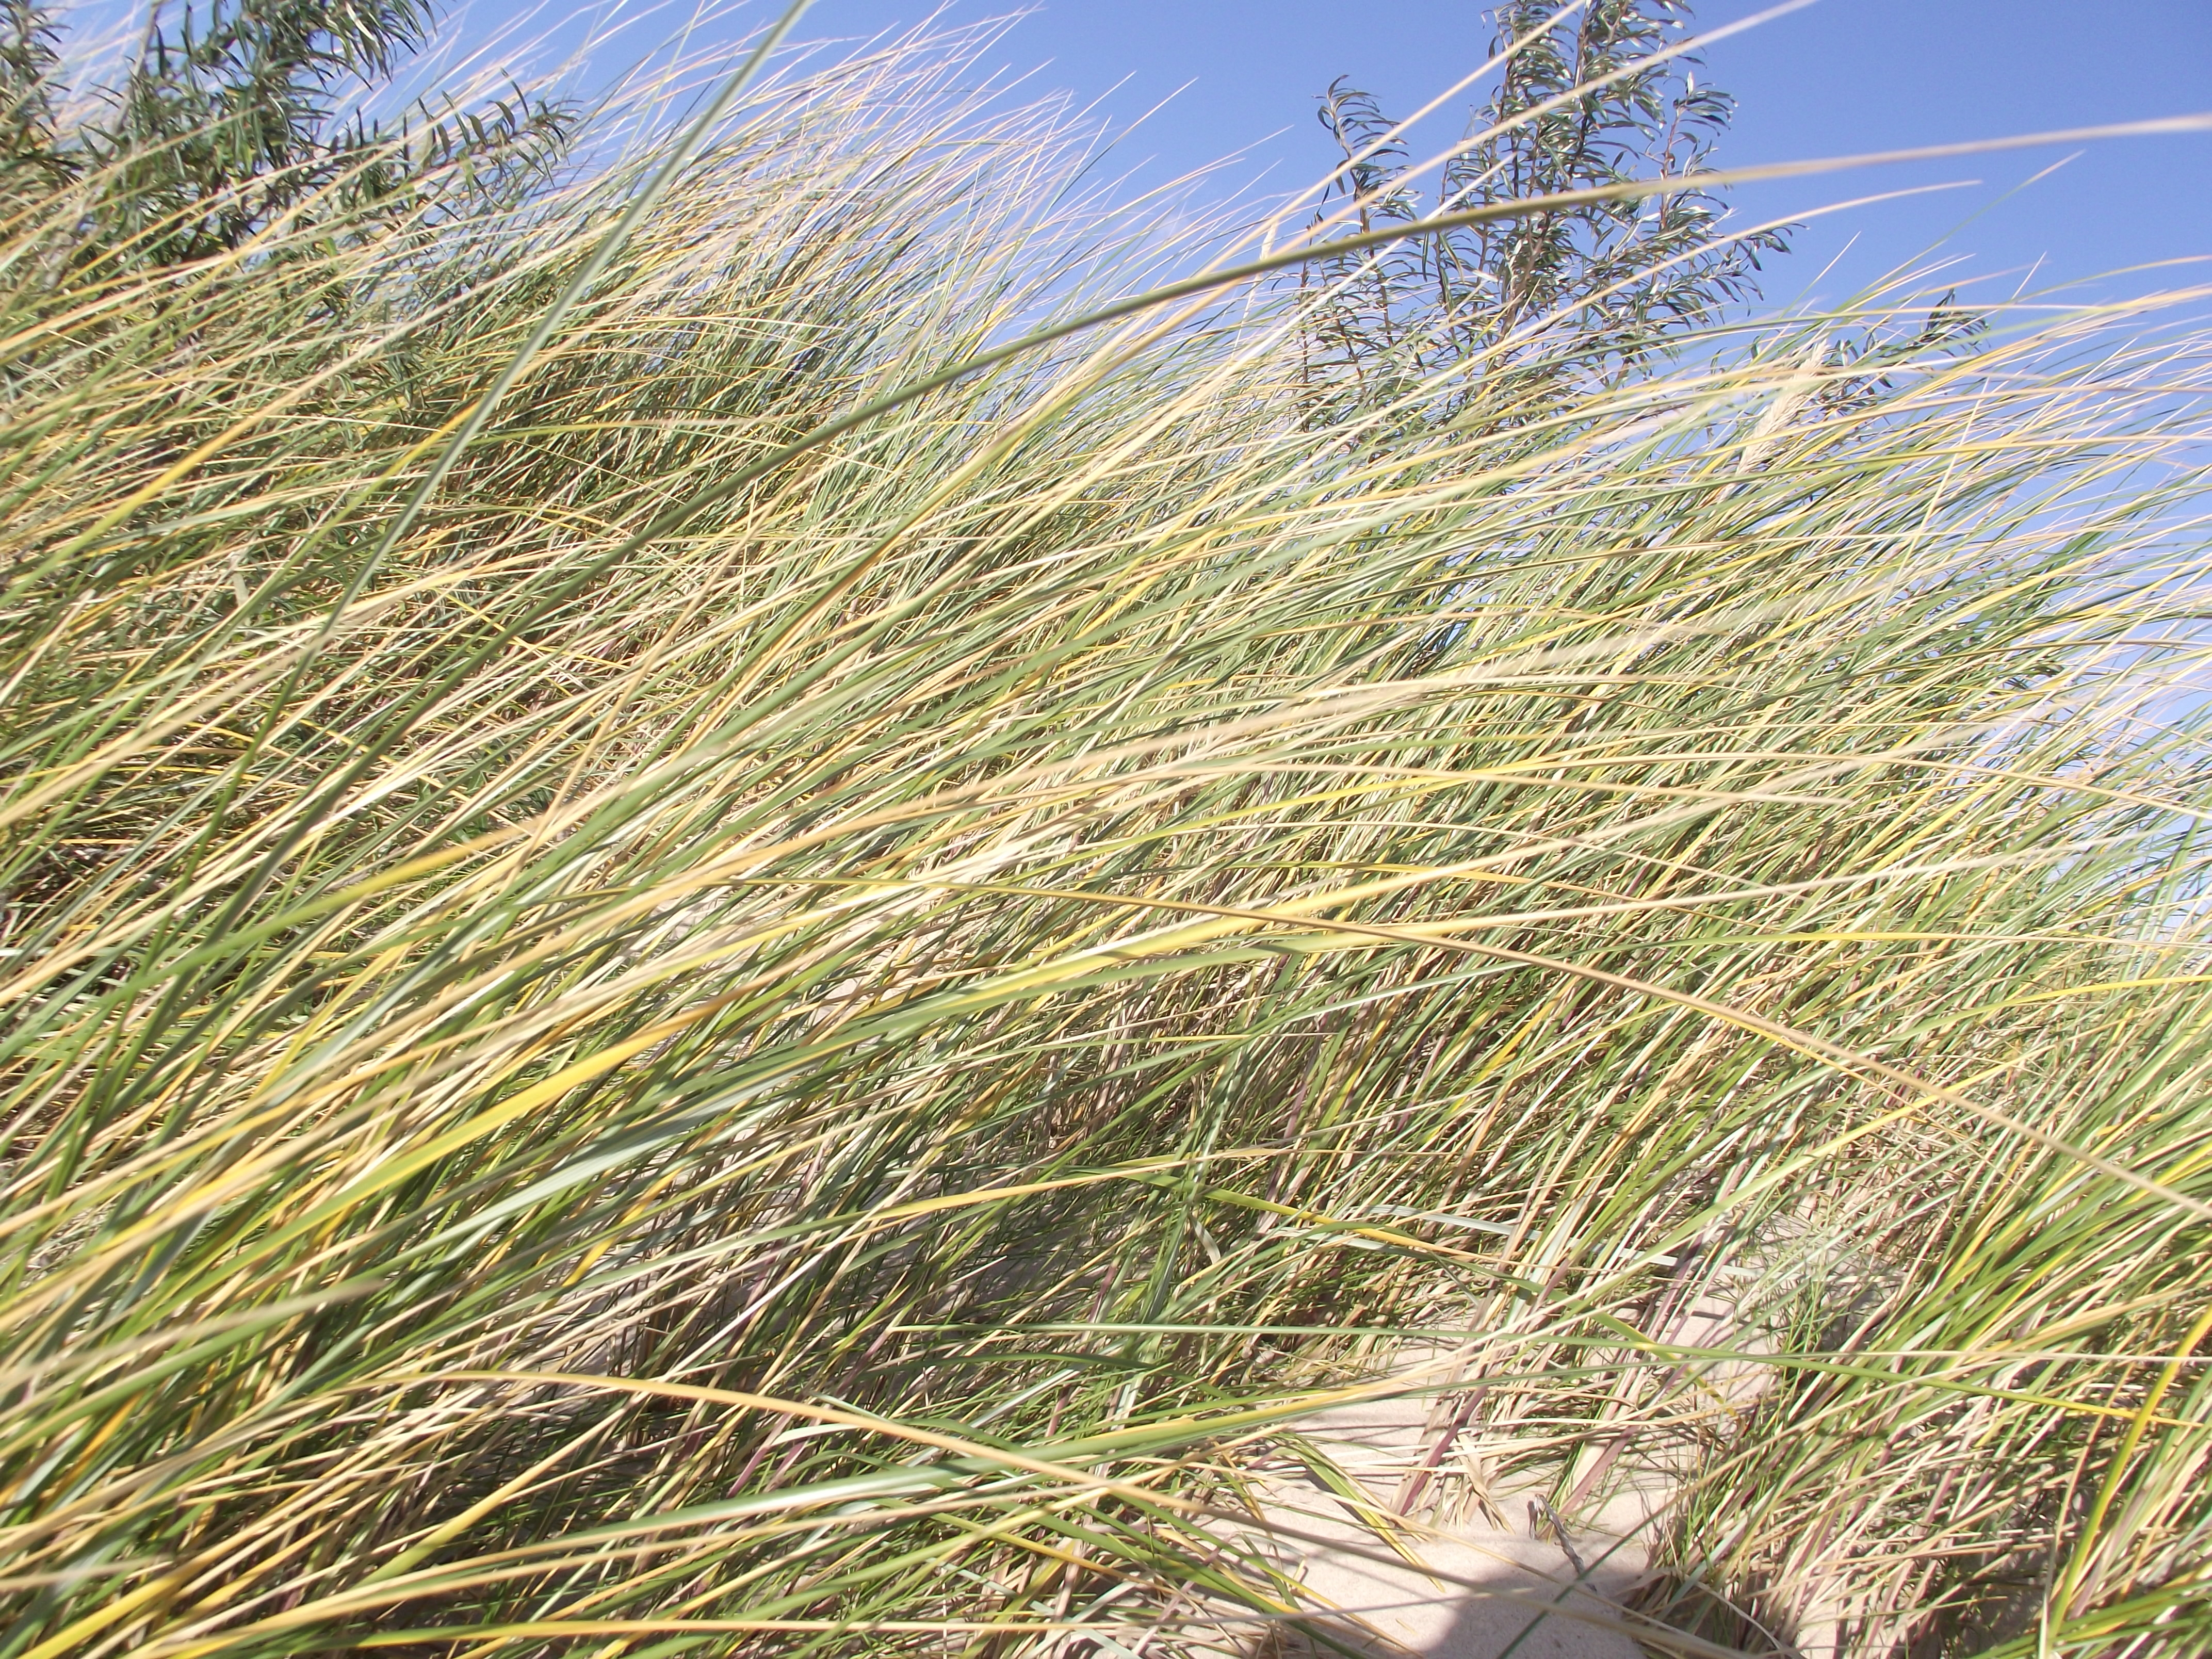 Dune grasses, 2012, Latvia, Ventspils, Sand, HQ Photo